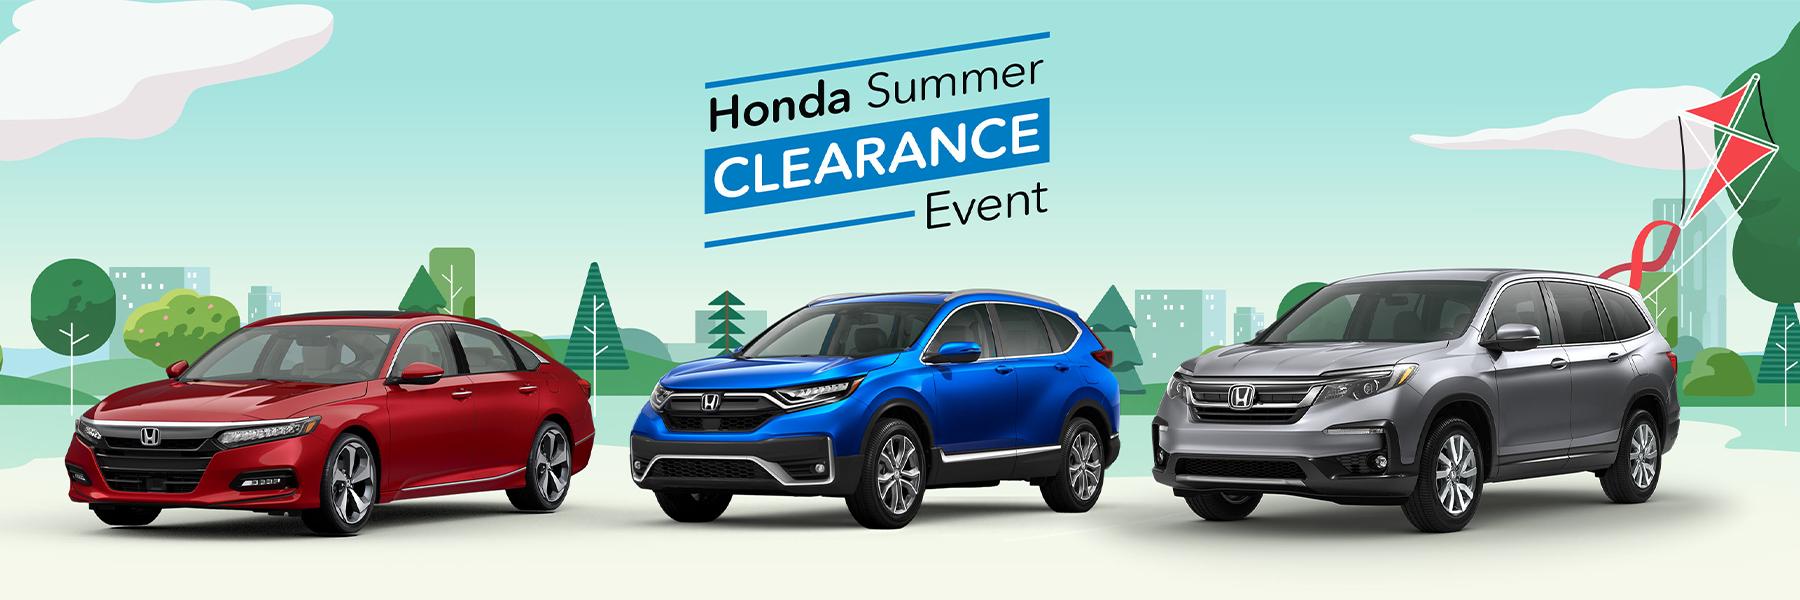 2020 Honda Summer Clearance